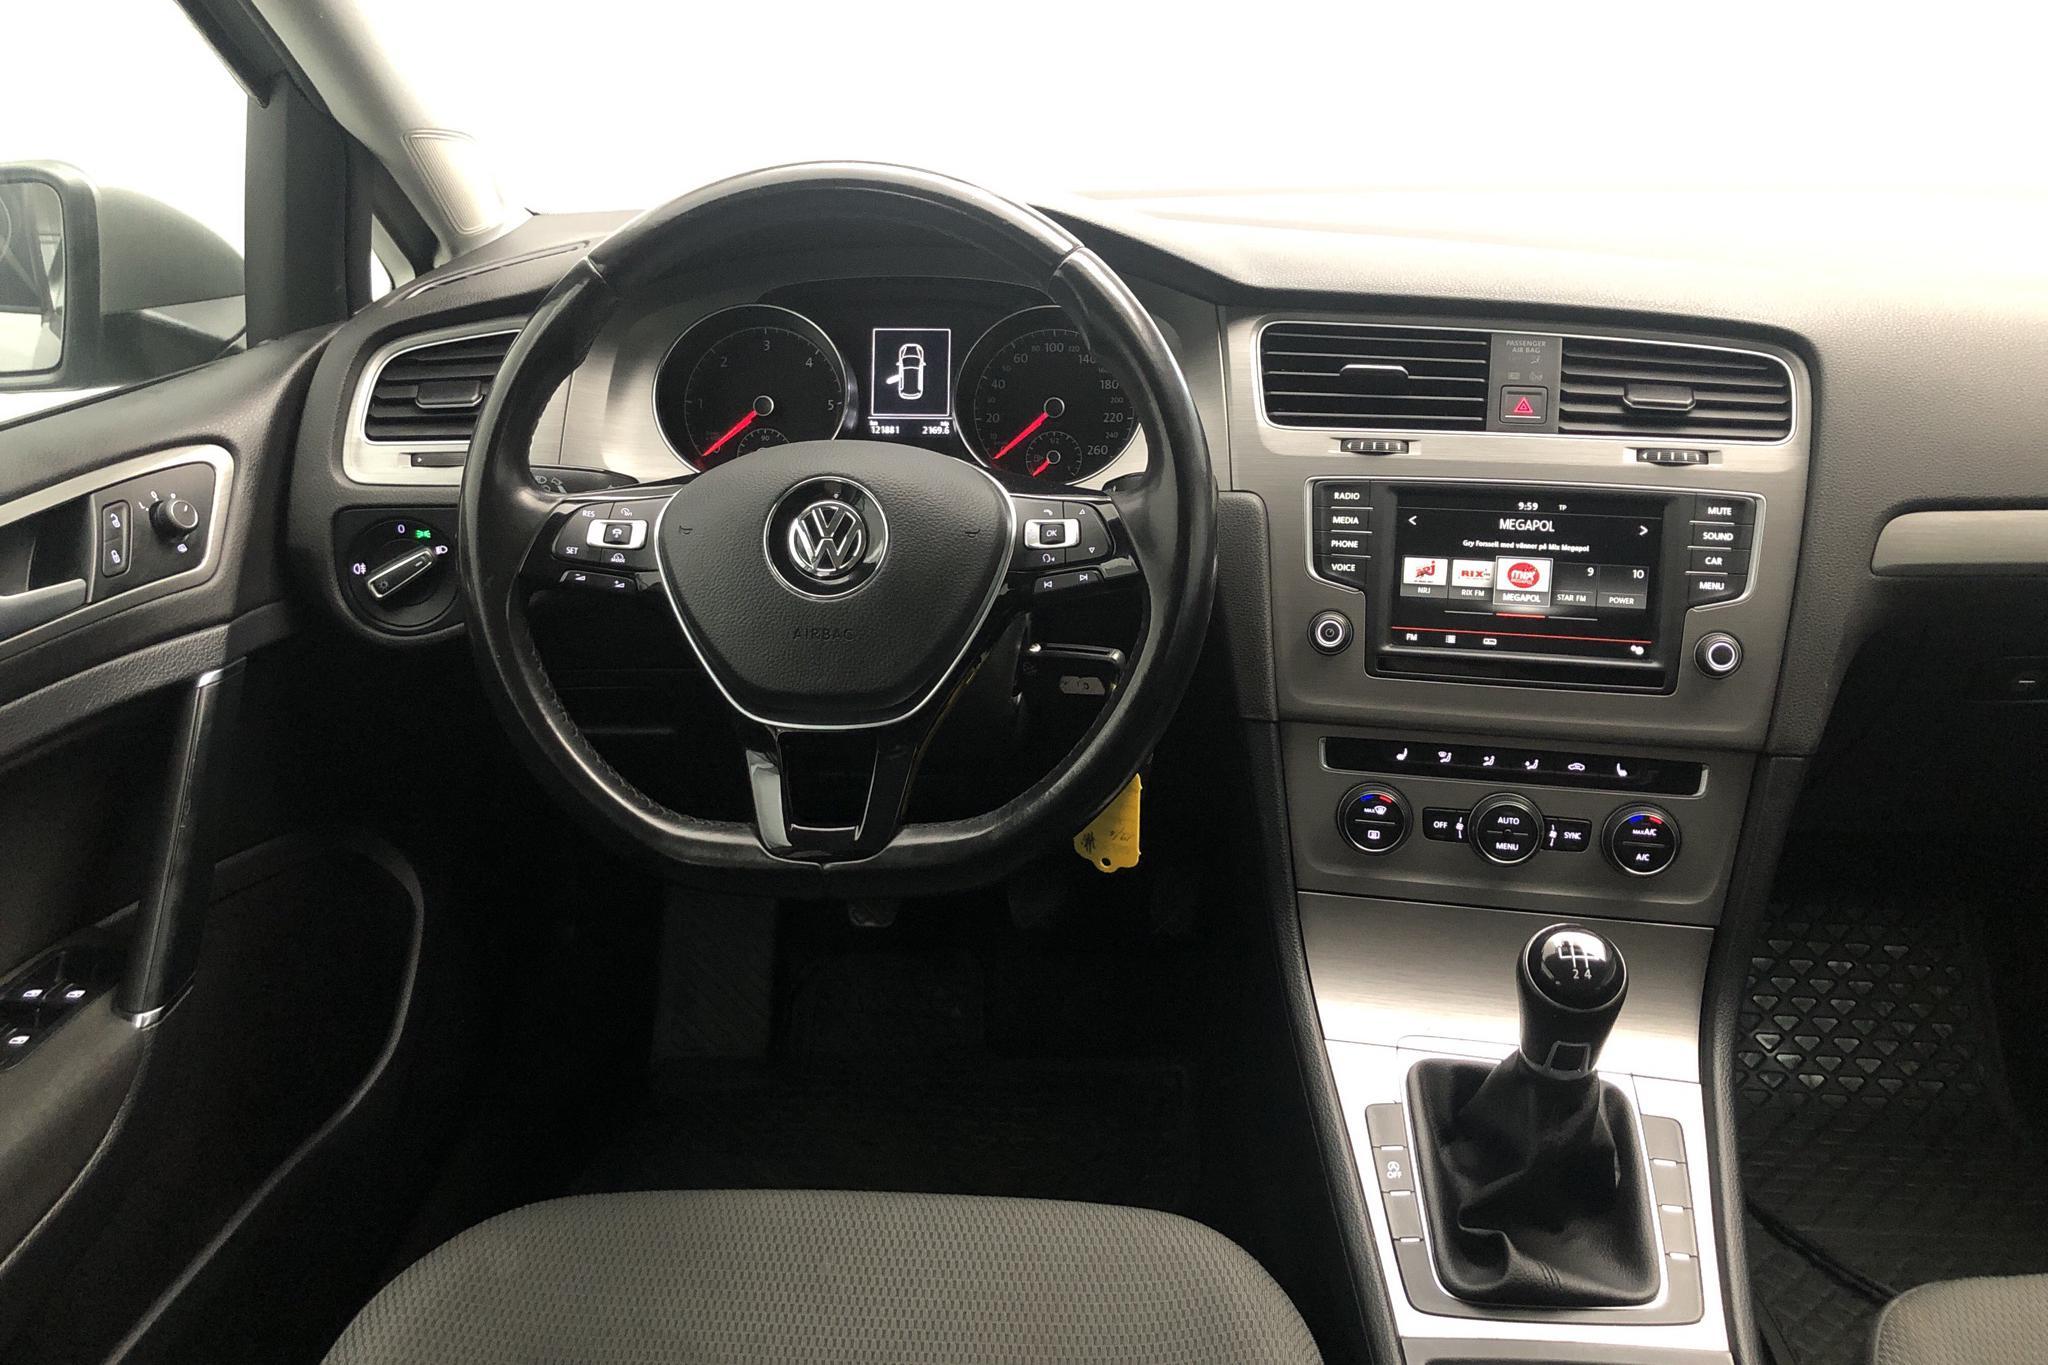 VW Golf VII 1.6 TDI BlueMotion 5dr (110hk) - 12 187 mil - Manuell - silver - 2016